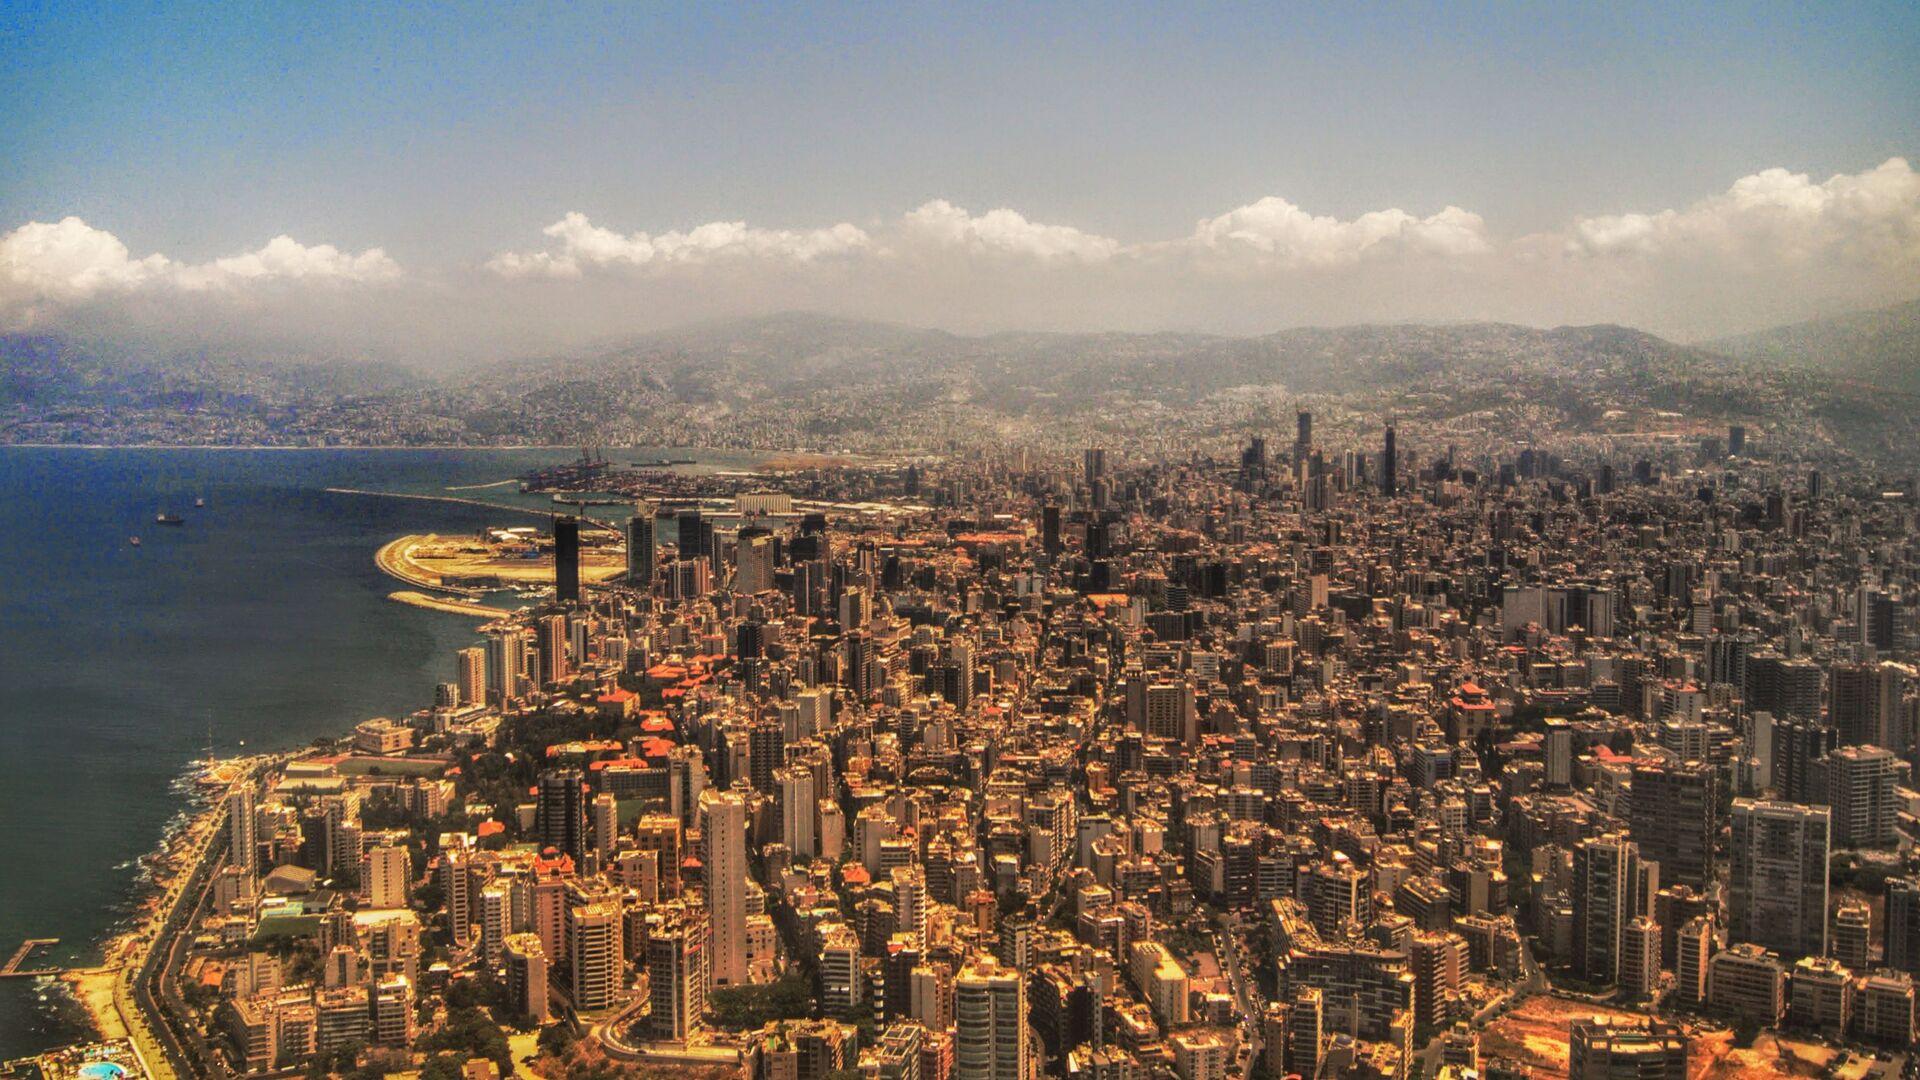 Beirut vista dall'alto - Sputnik Italia, 1920, 29.06.2021